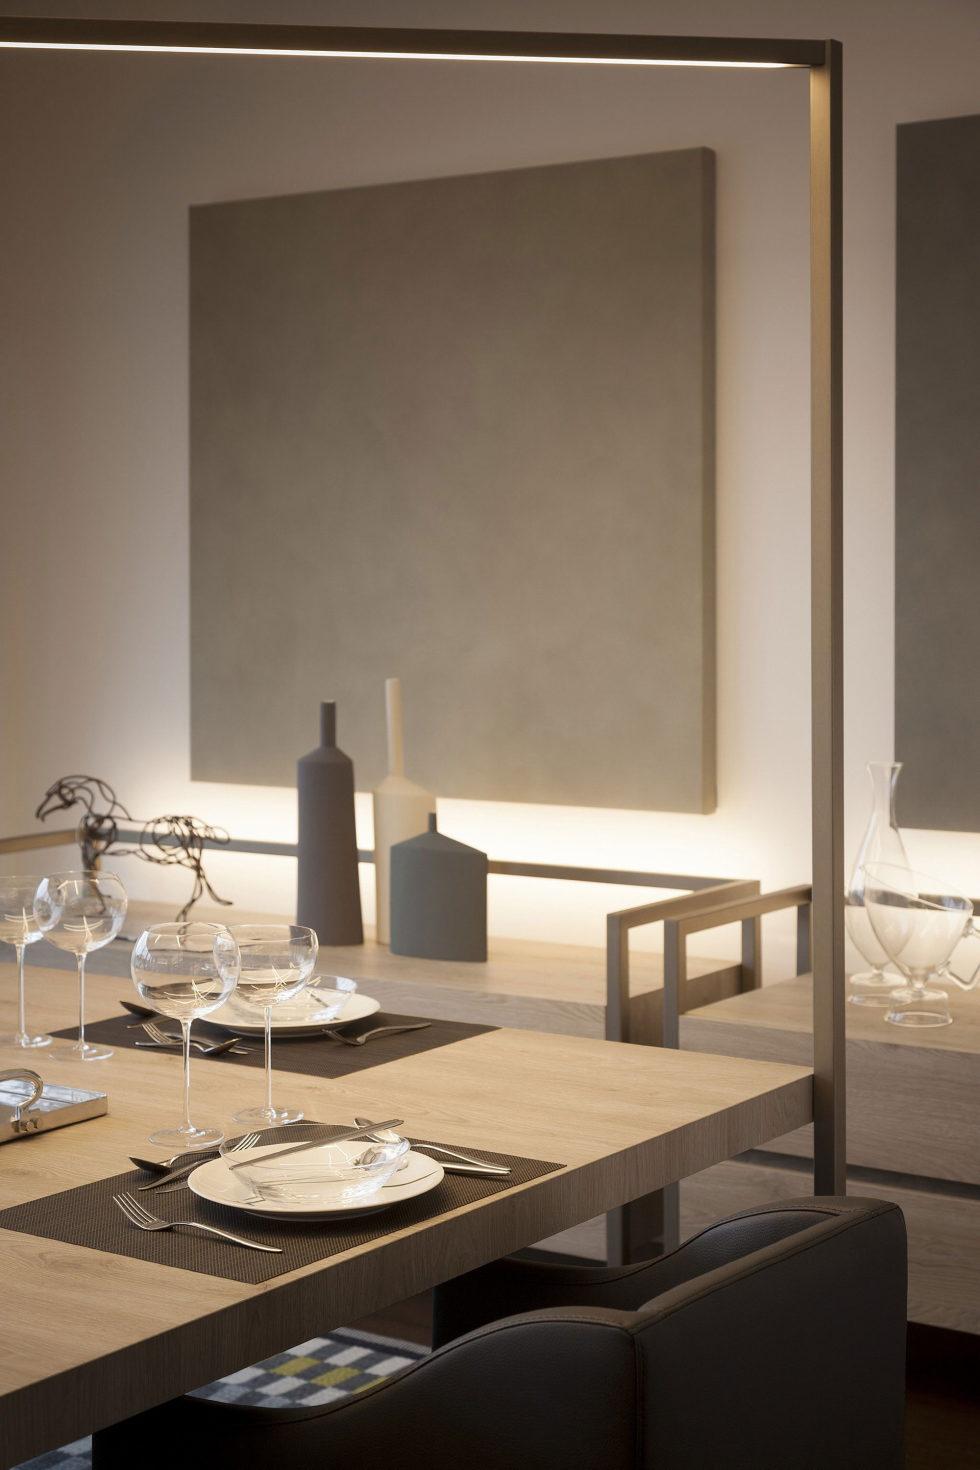 The luxury Citylife apartment from Matteo Nunziati, Milan, Italy 4